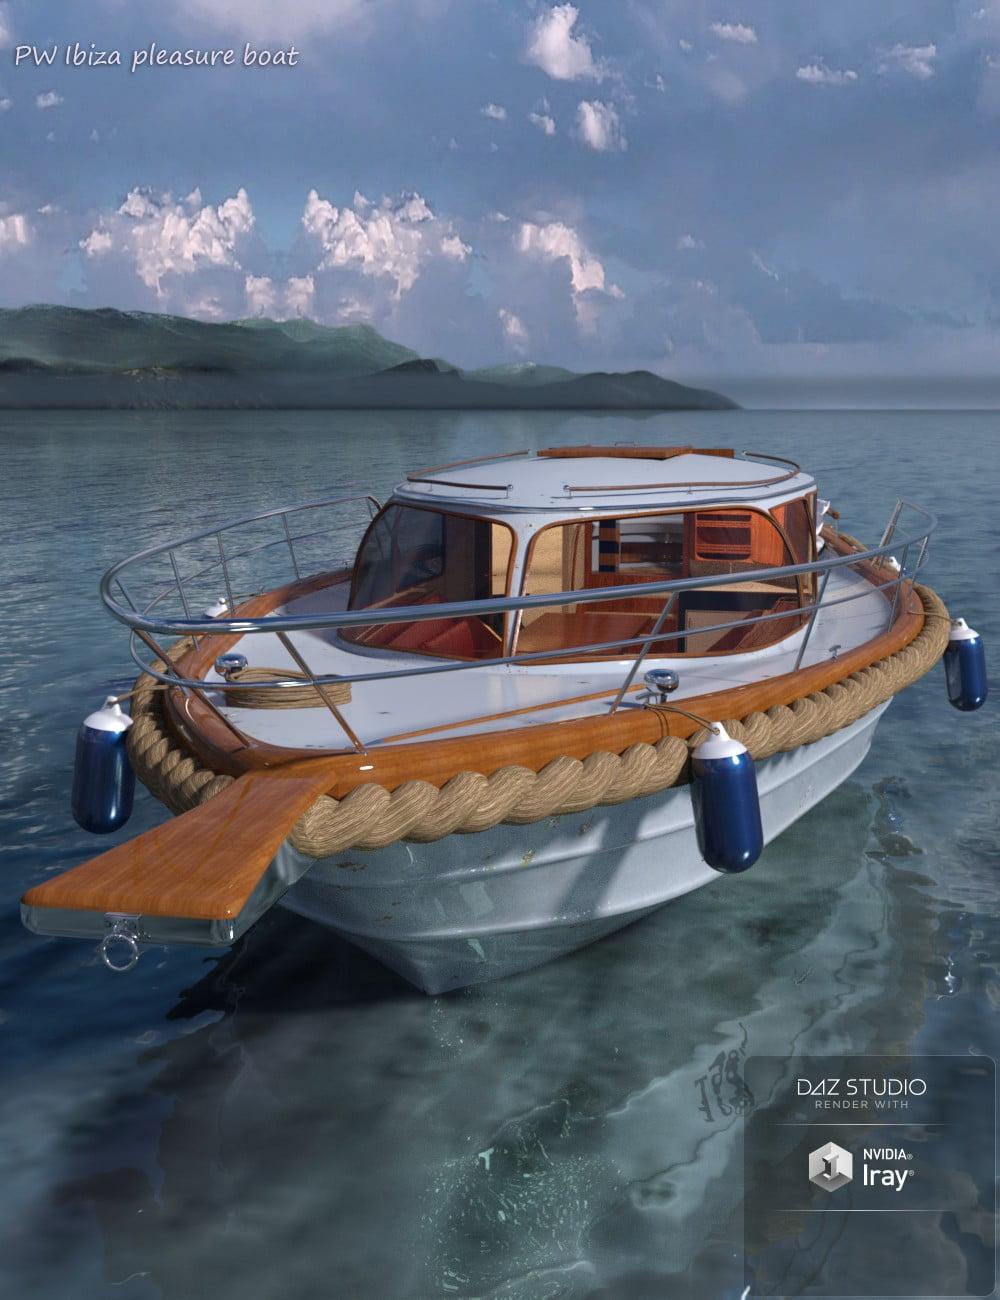 PW Ibiza Pleasure Boat